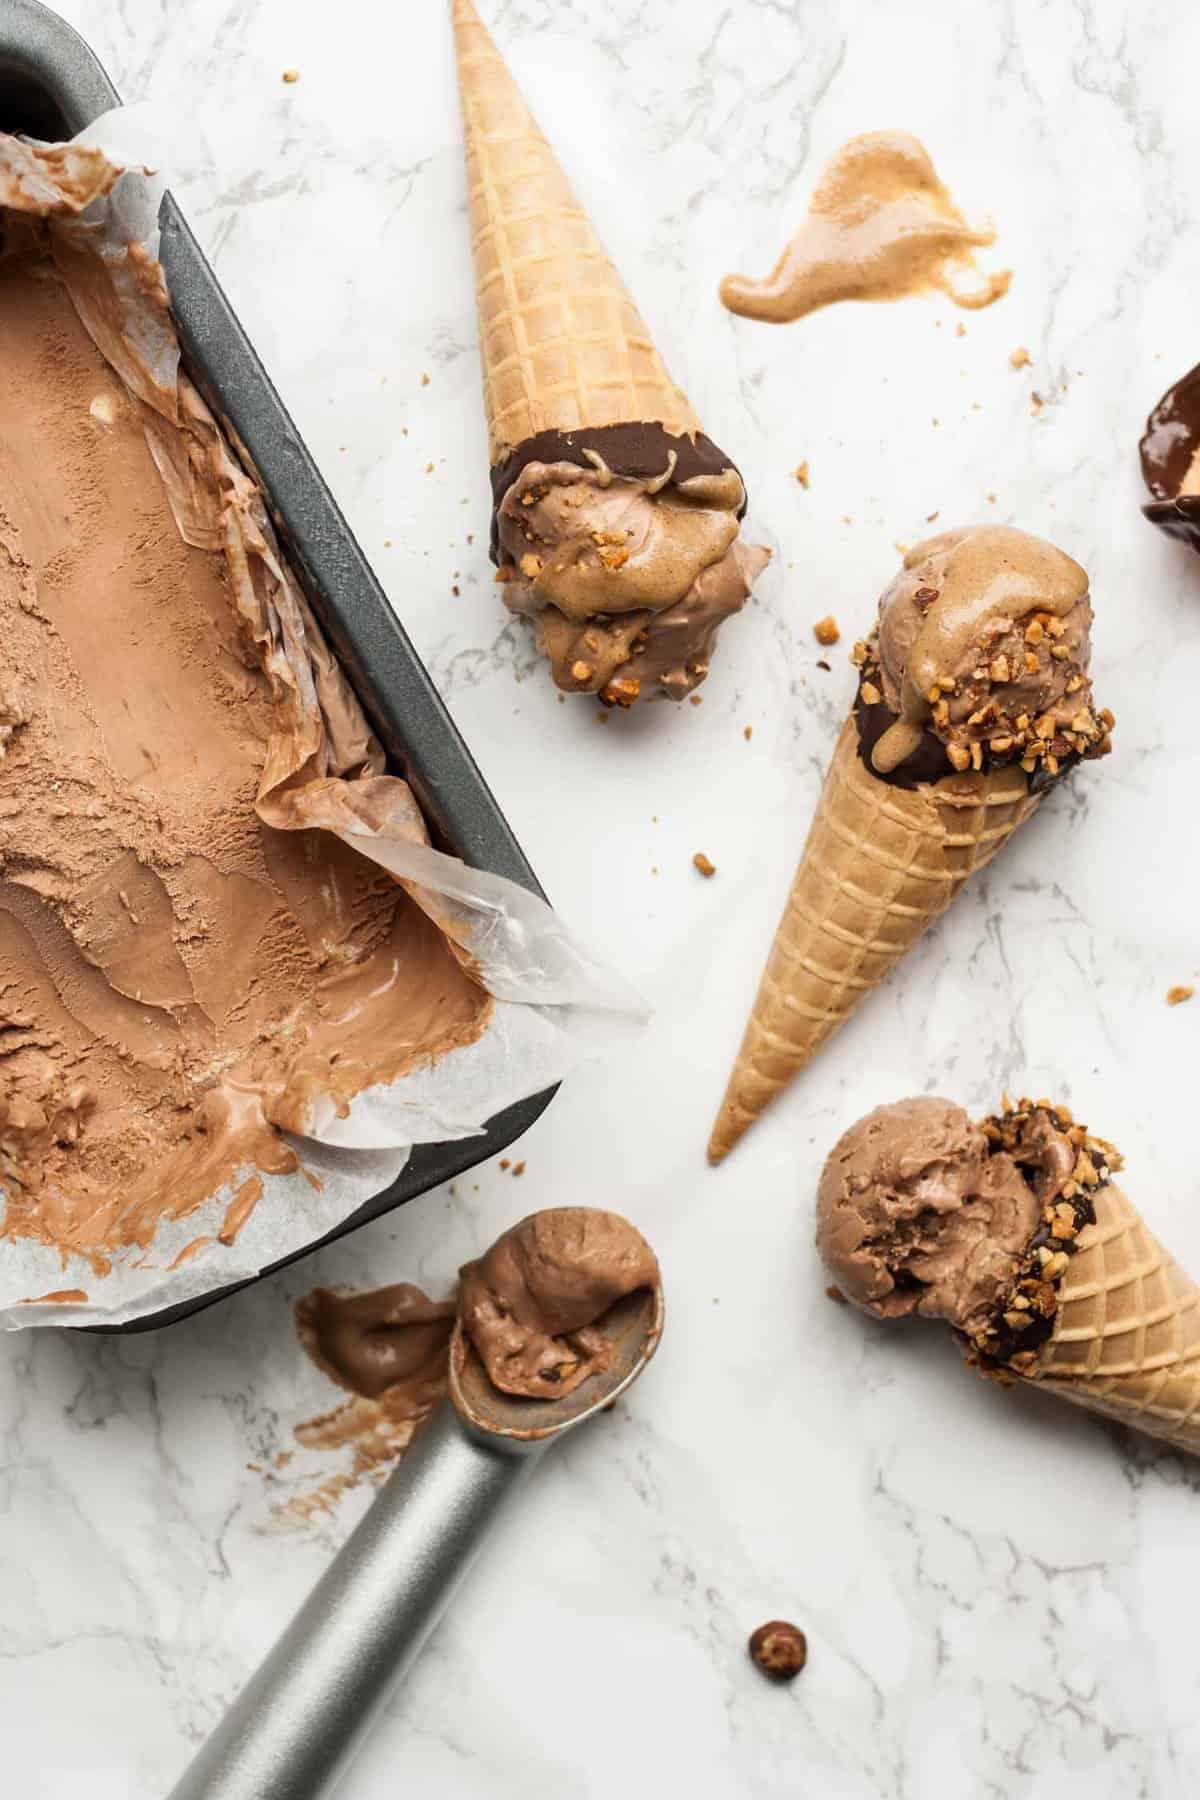 No Churn Mocha Ice Cream with Hazelnut Swirl - an easy no churn ice cream recipe packed with chocolate and coffee flavour and a hazelnut butter swirl | eatloveeats.com